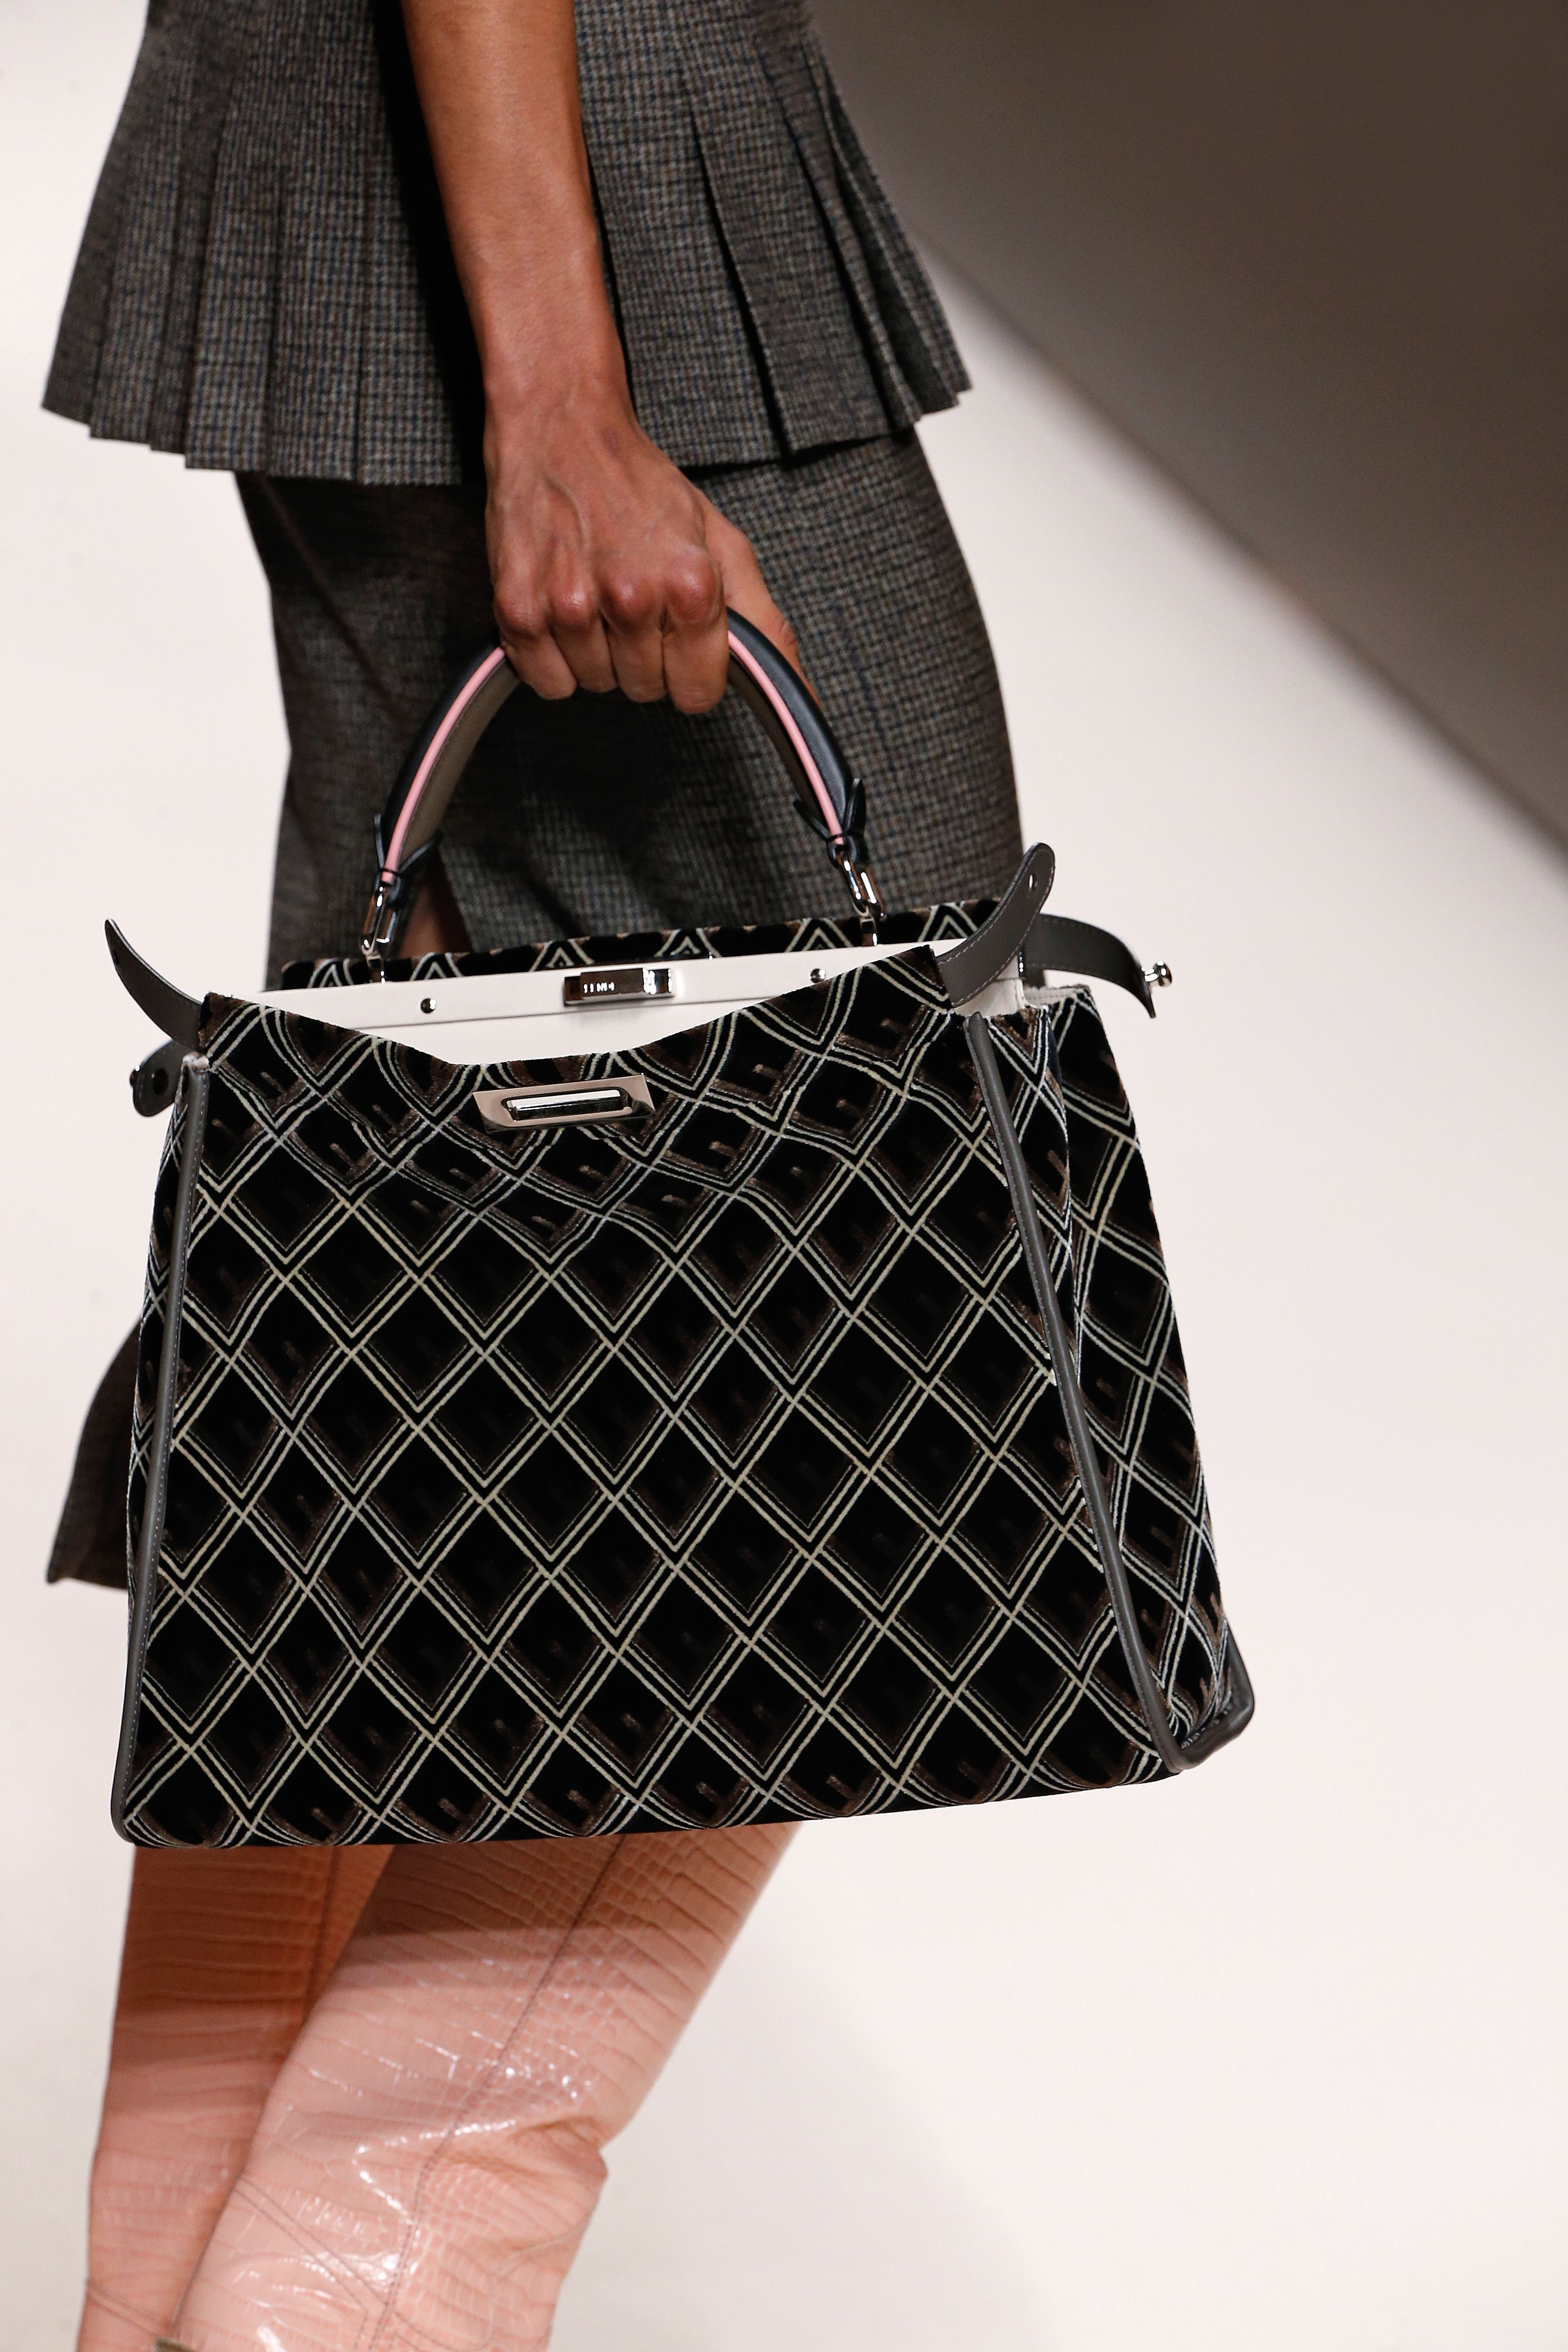 Fendi Fall Winter 2018-19 Fashion Show  f59387c2f75cf